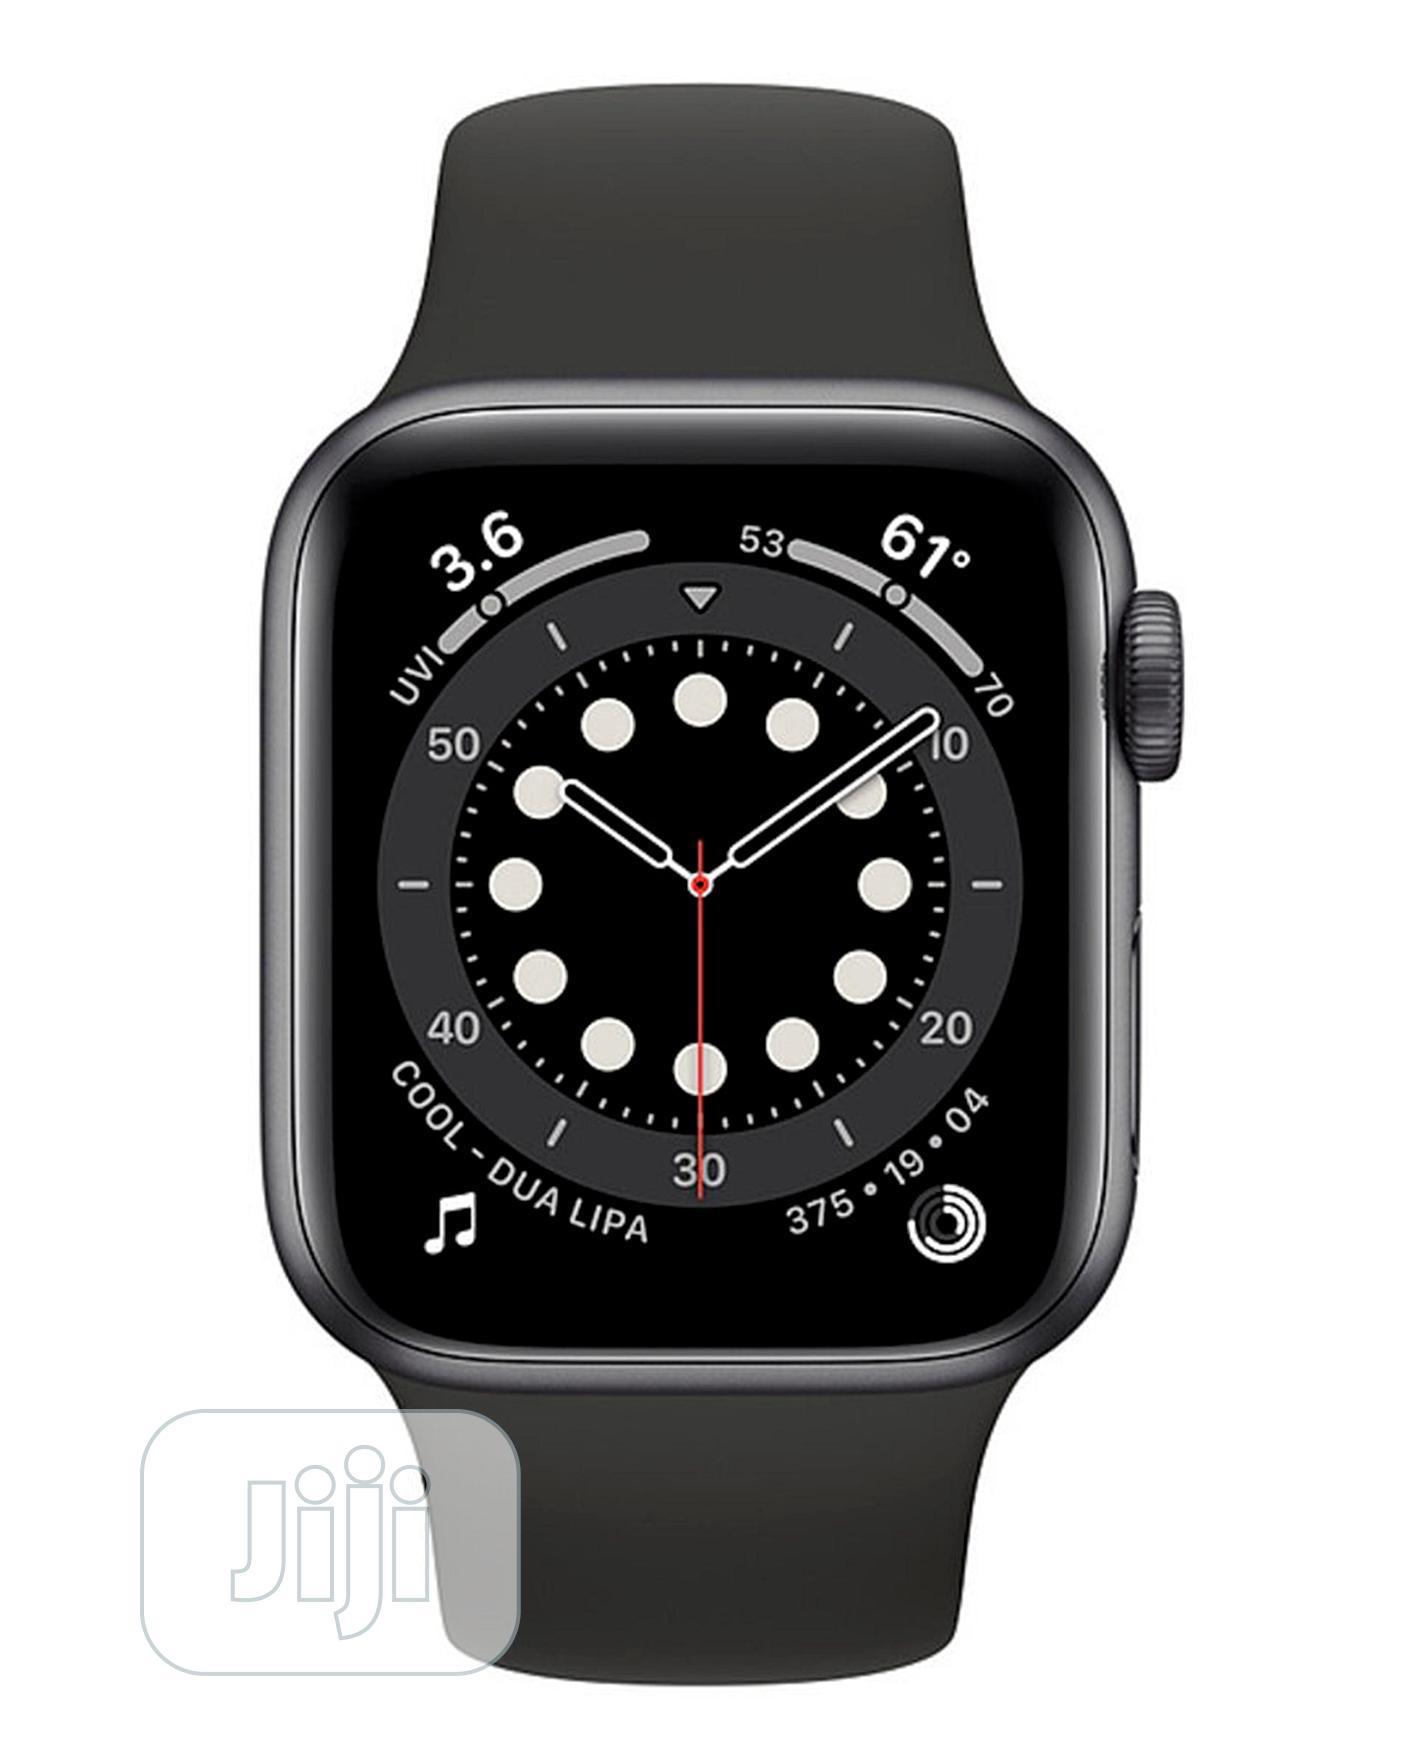 Apple Watch Series 6 (GPS, 40mm) - Space Gray Aluminum Case